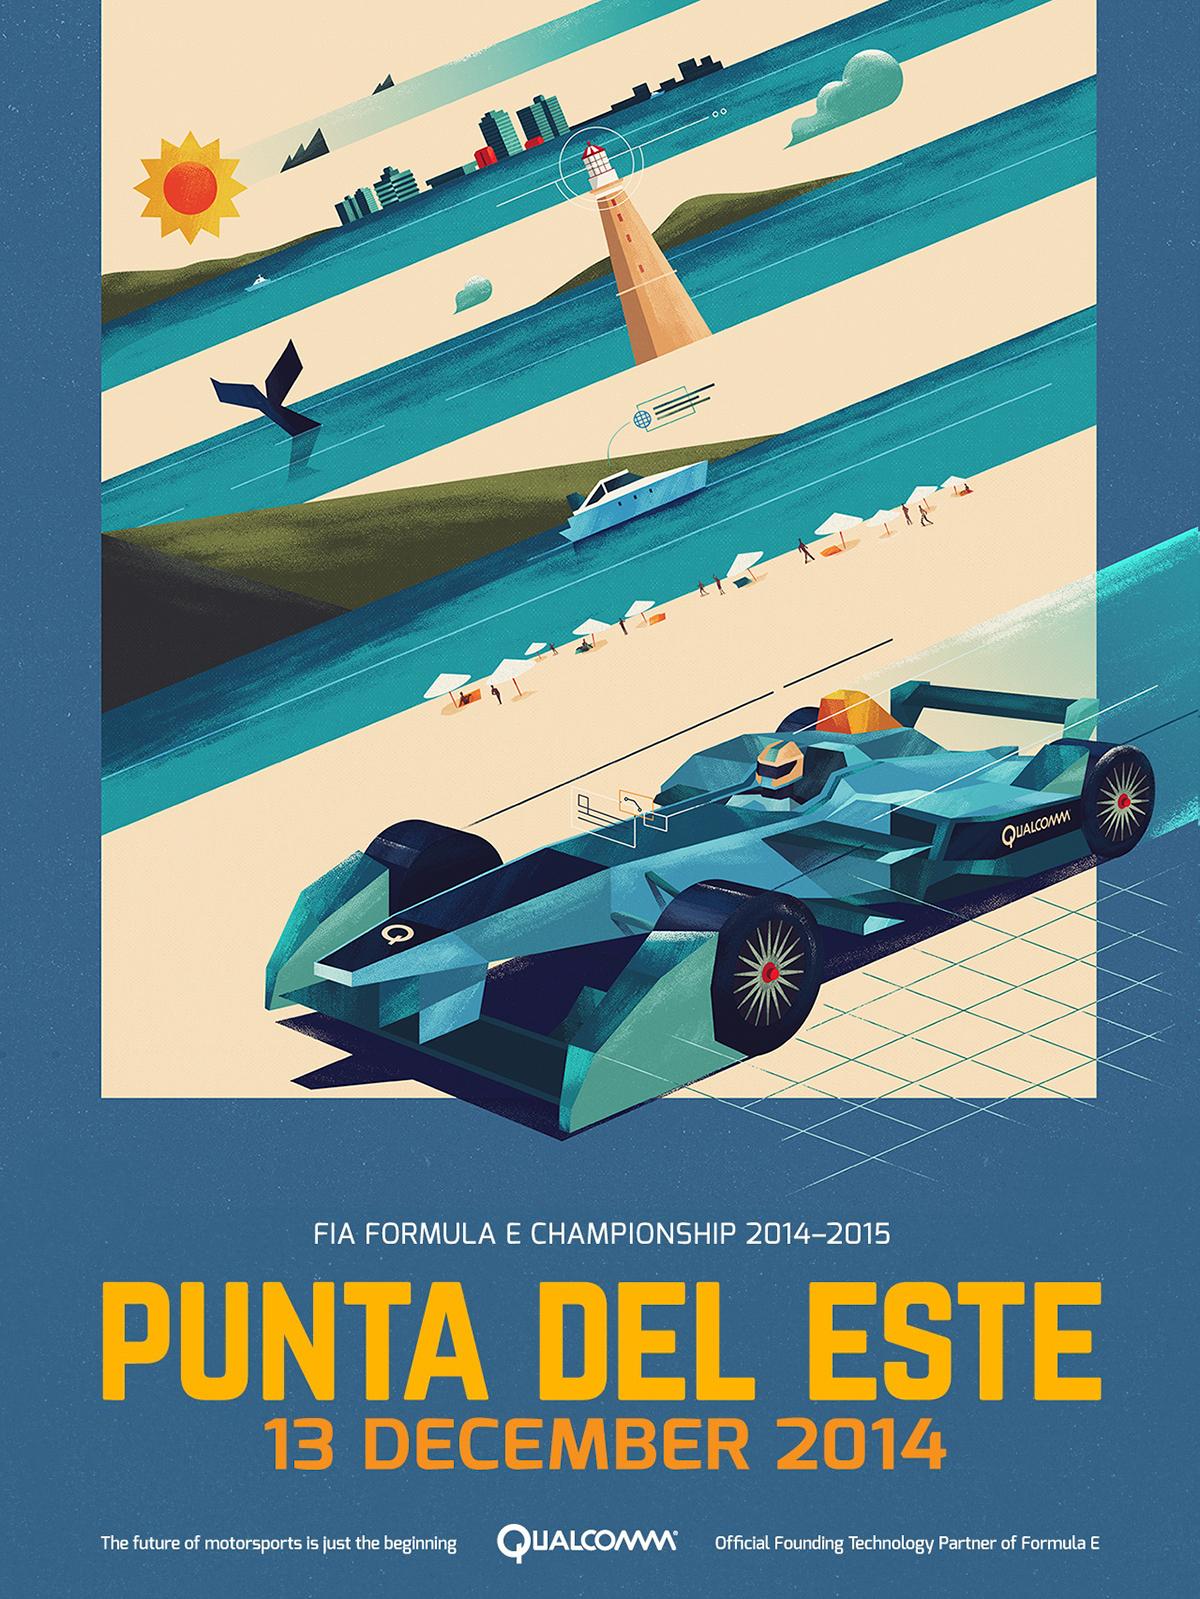 Punta Del Este Formula E Championship Poster by Dan Matutina